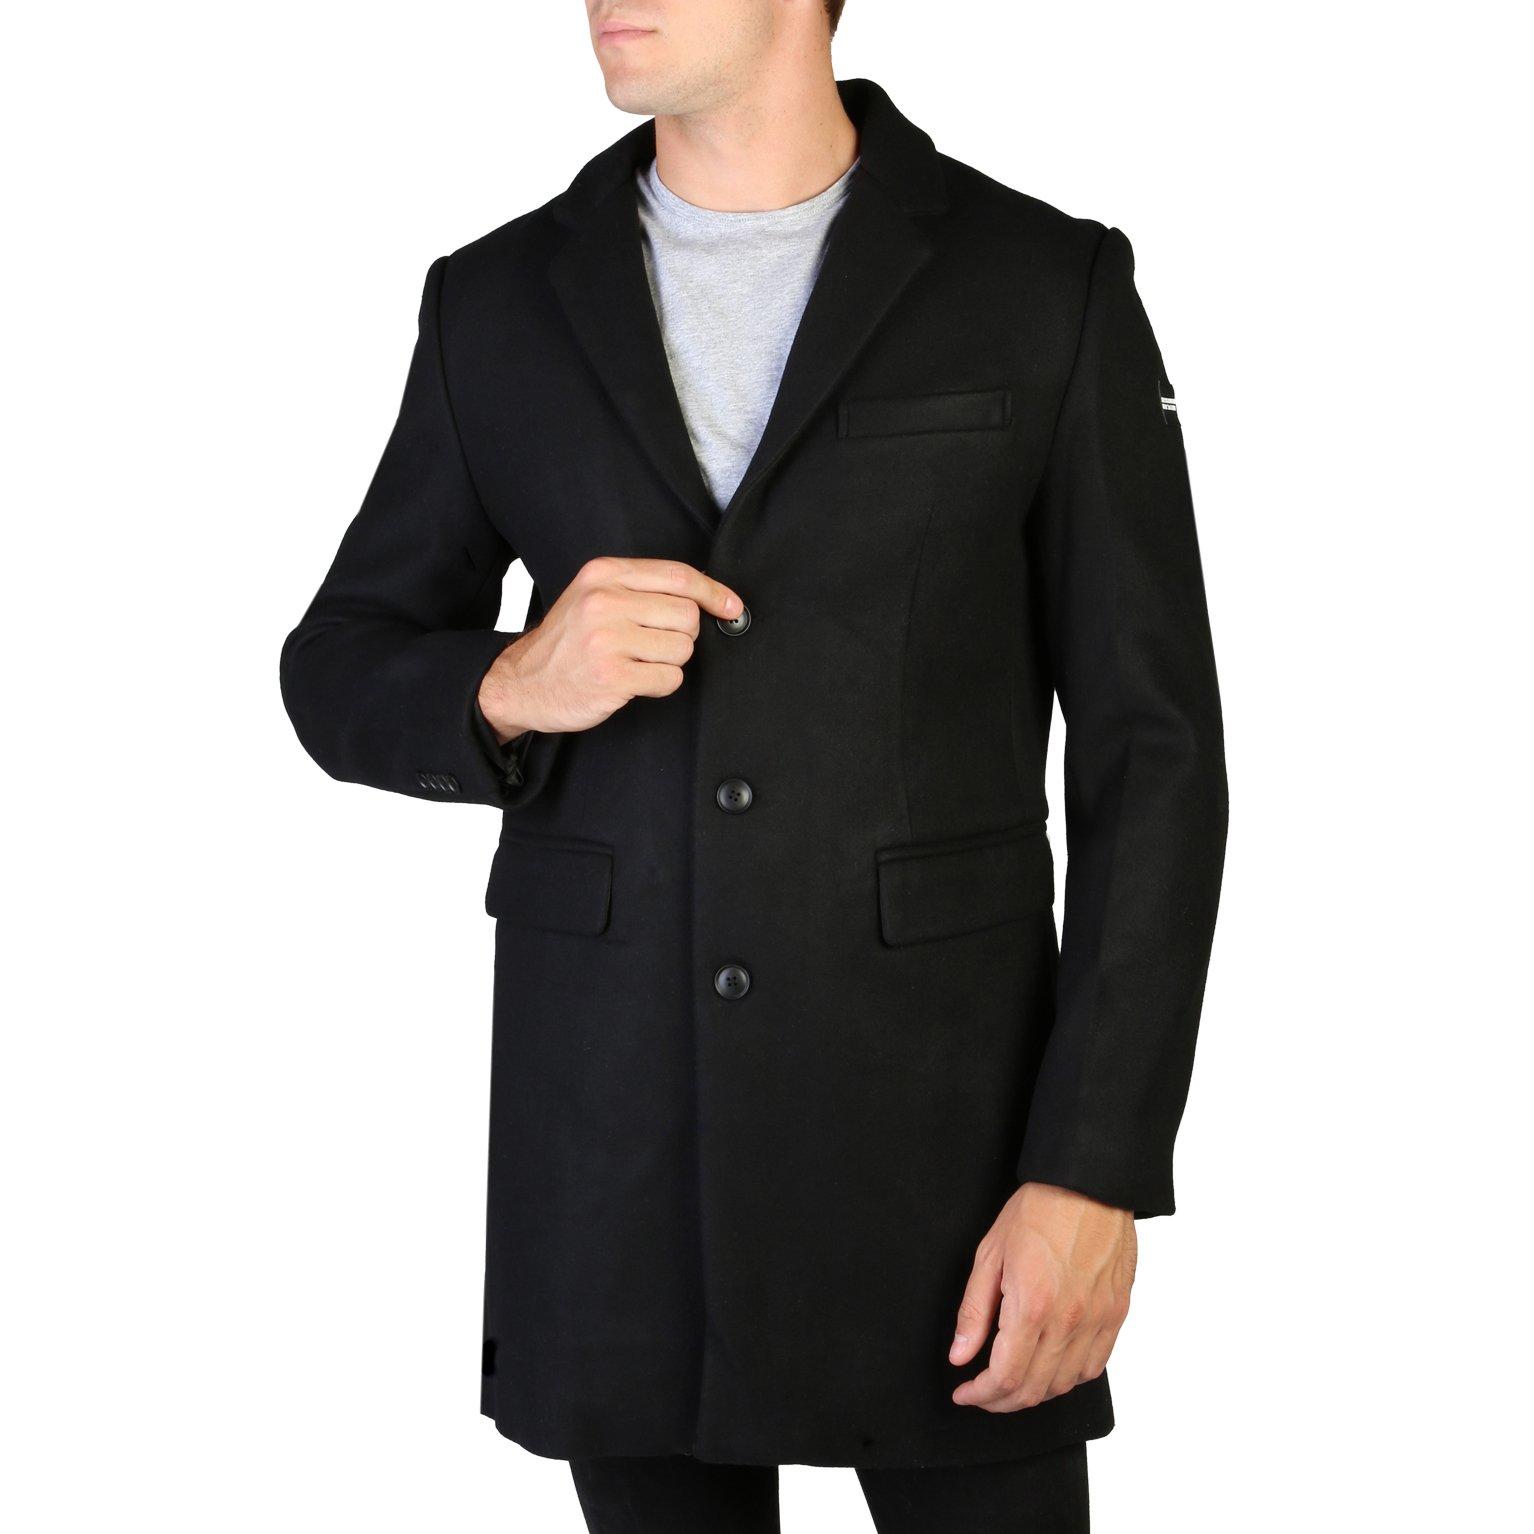 Alessandro Dell'Acqua Men's Coat Various Colours 348399 - black M